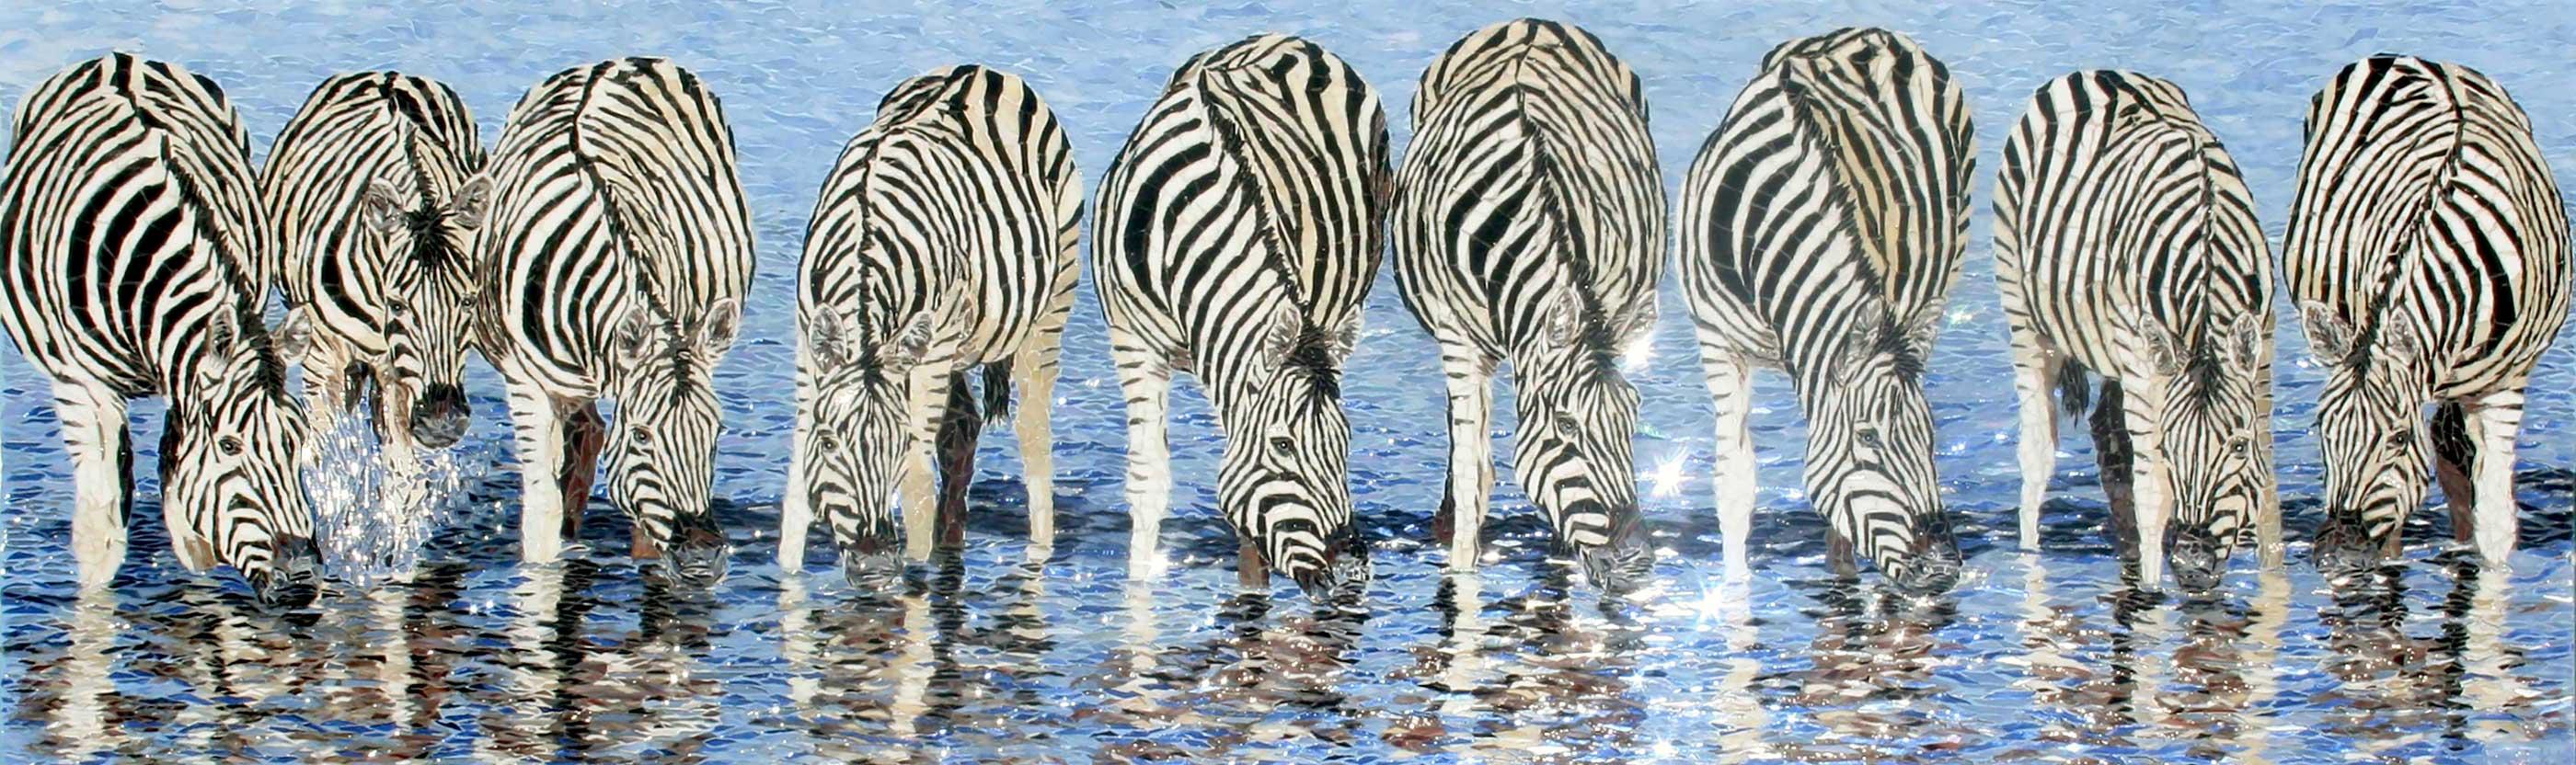 Sarah-Pryke---zebras